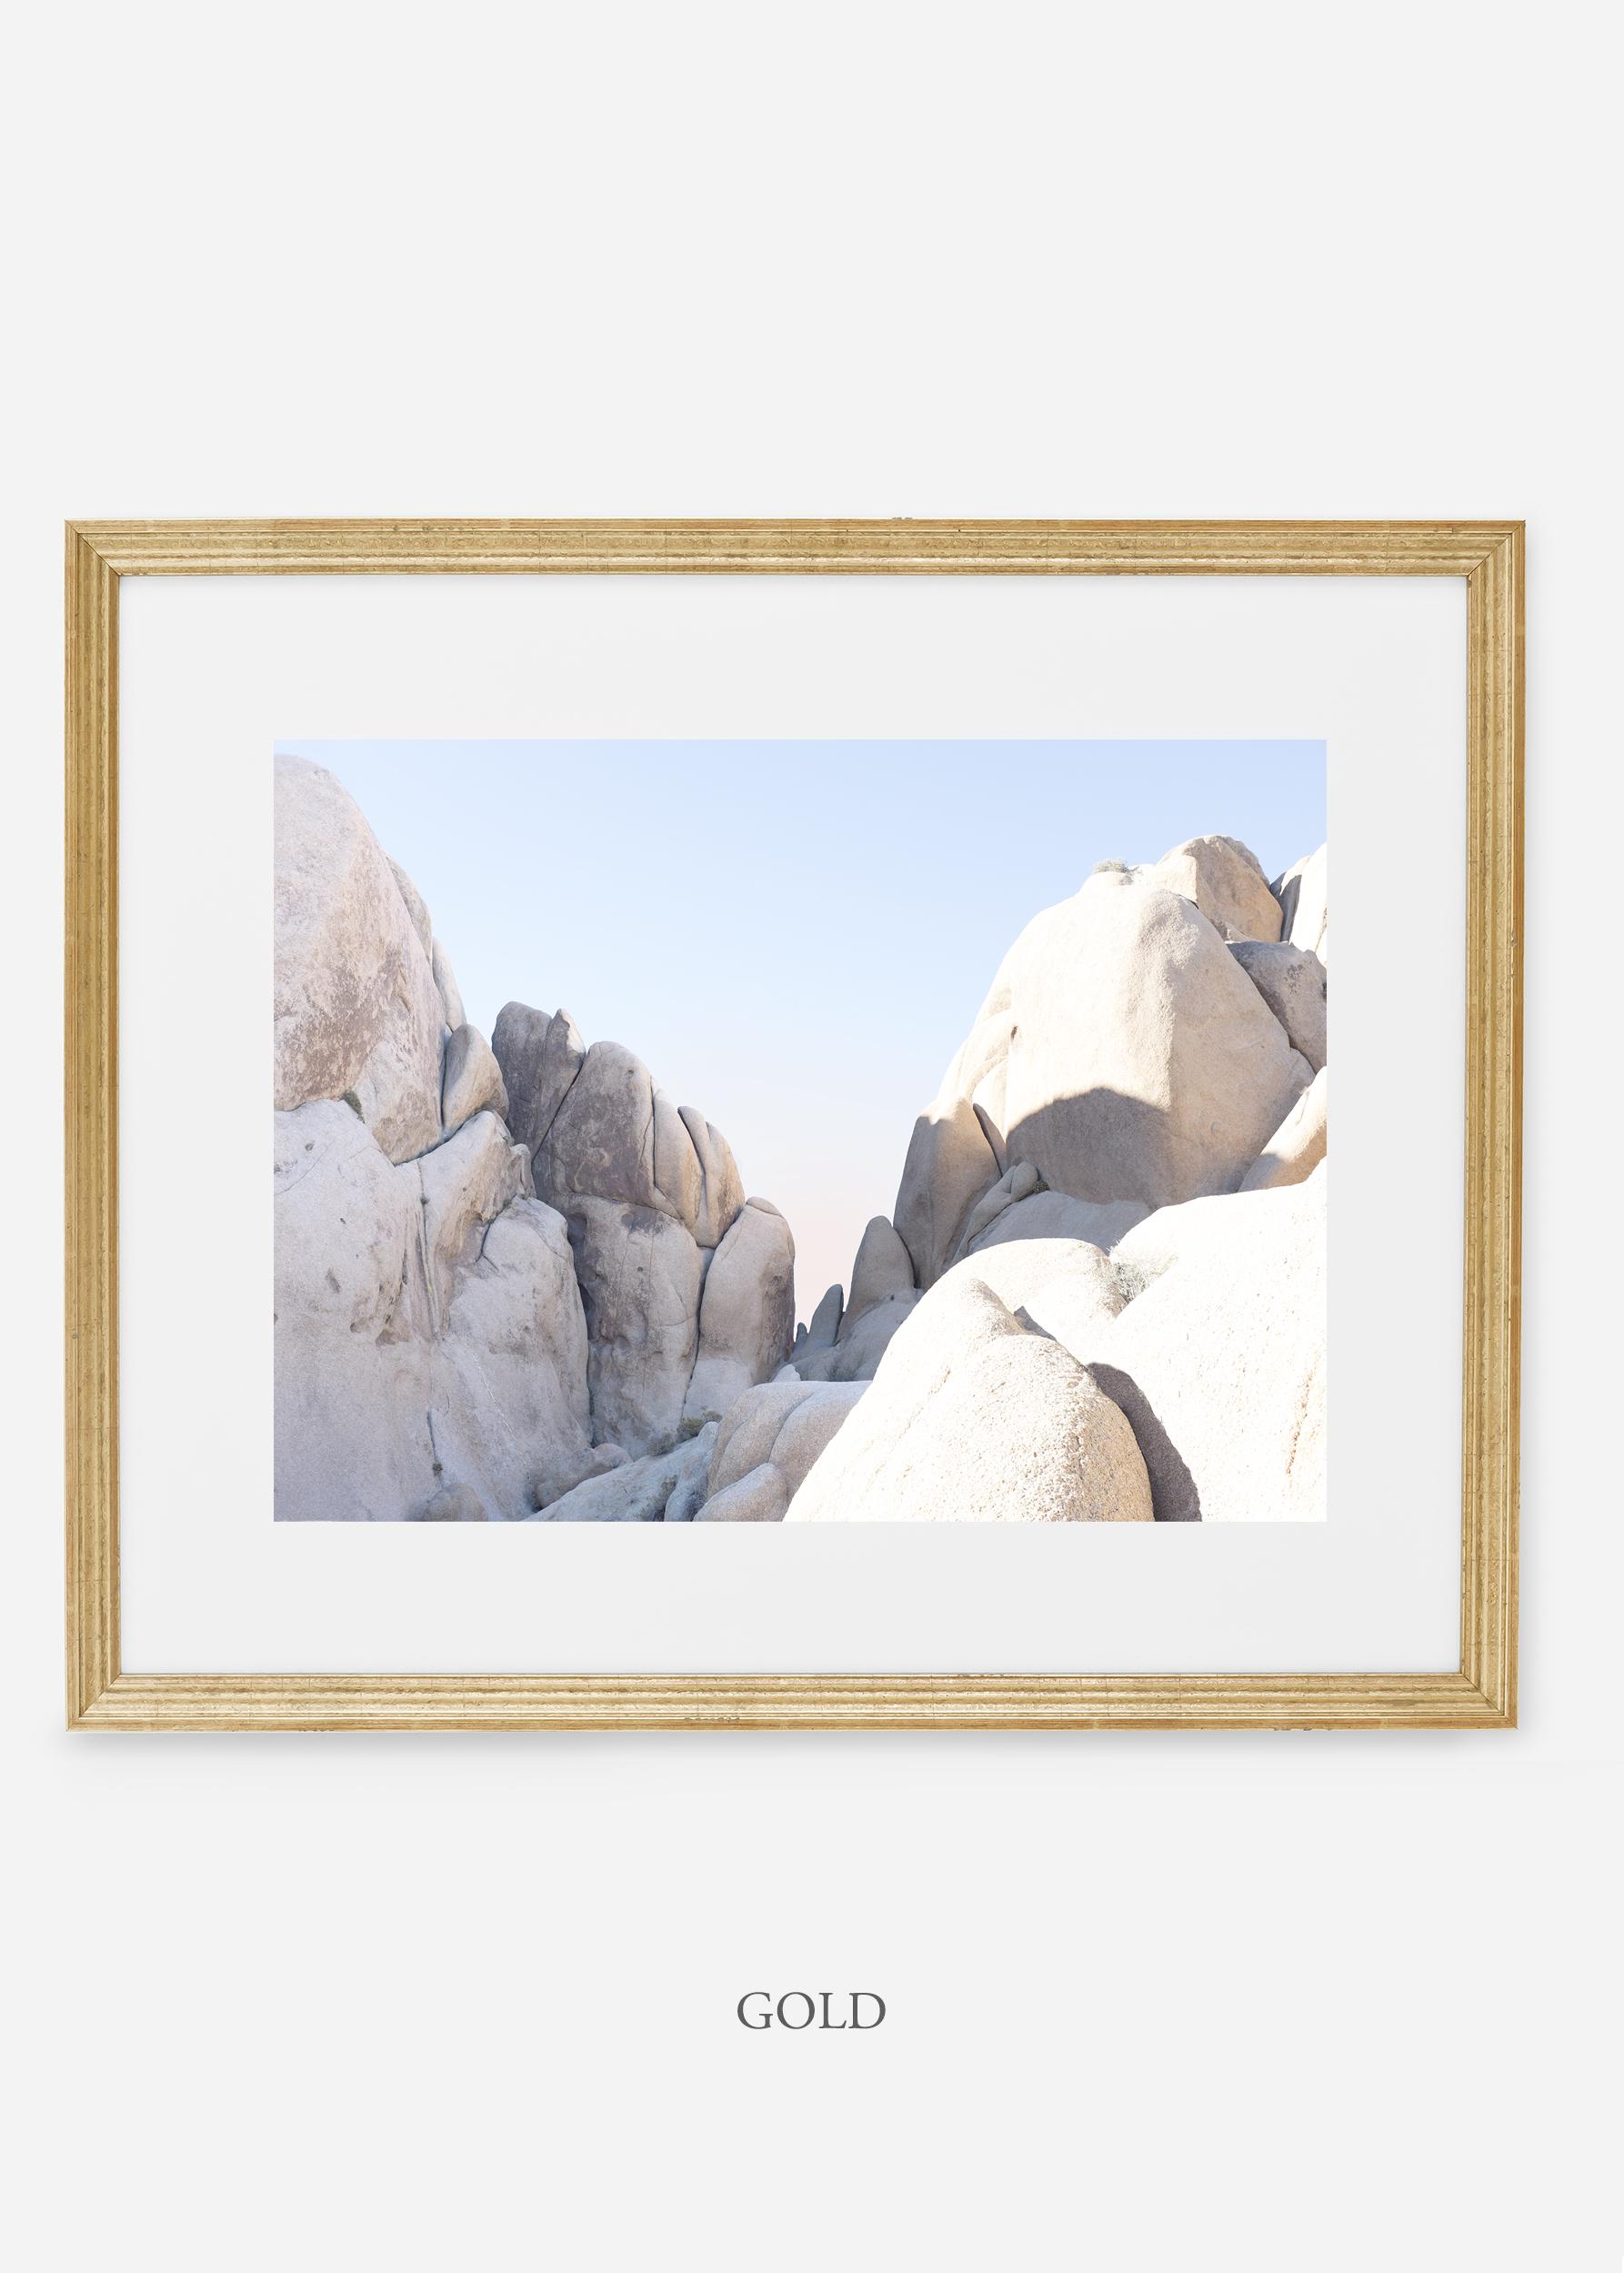 WilderCalifornia_gold_JoshuaTree_No.18_interiordesign_prints_art.jpg